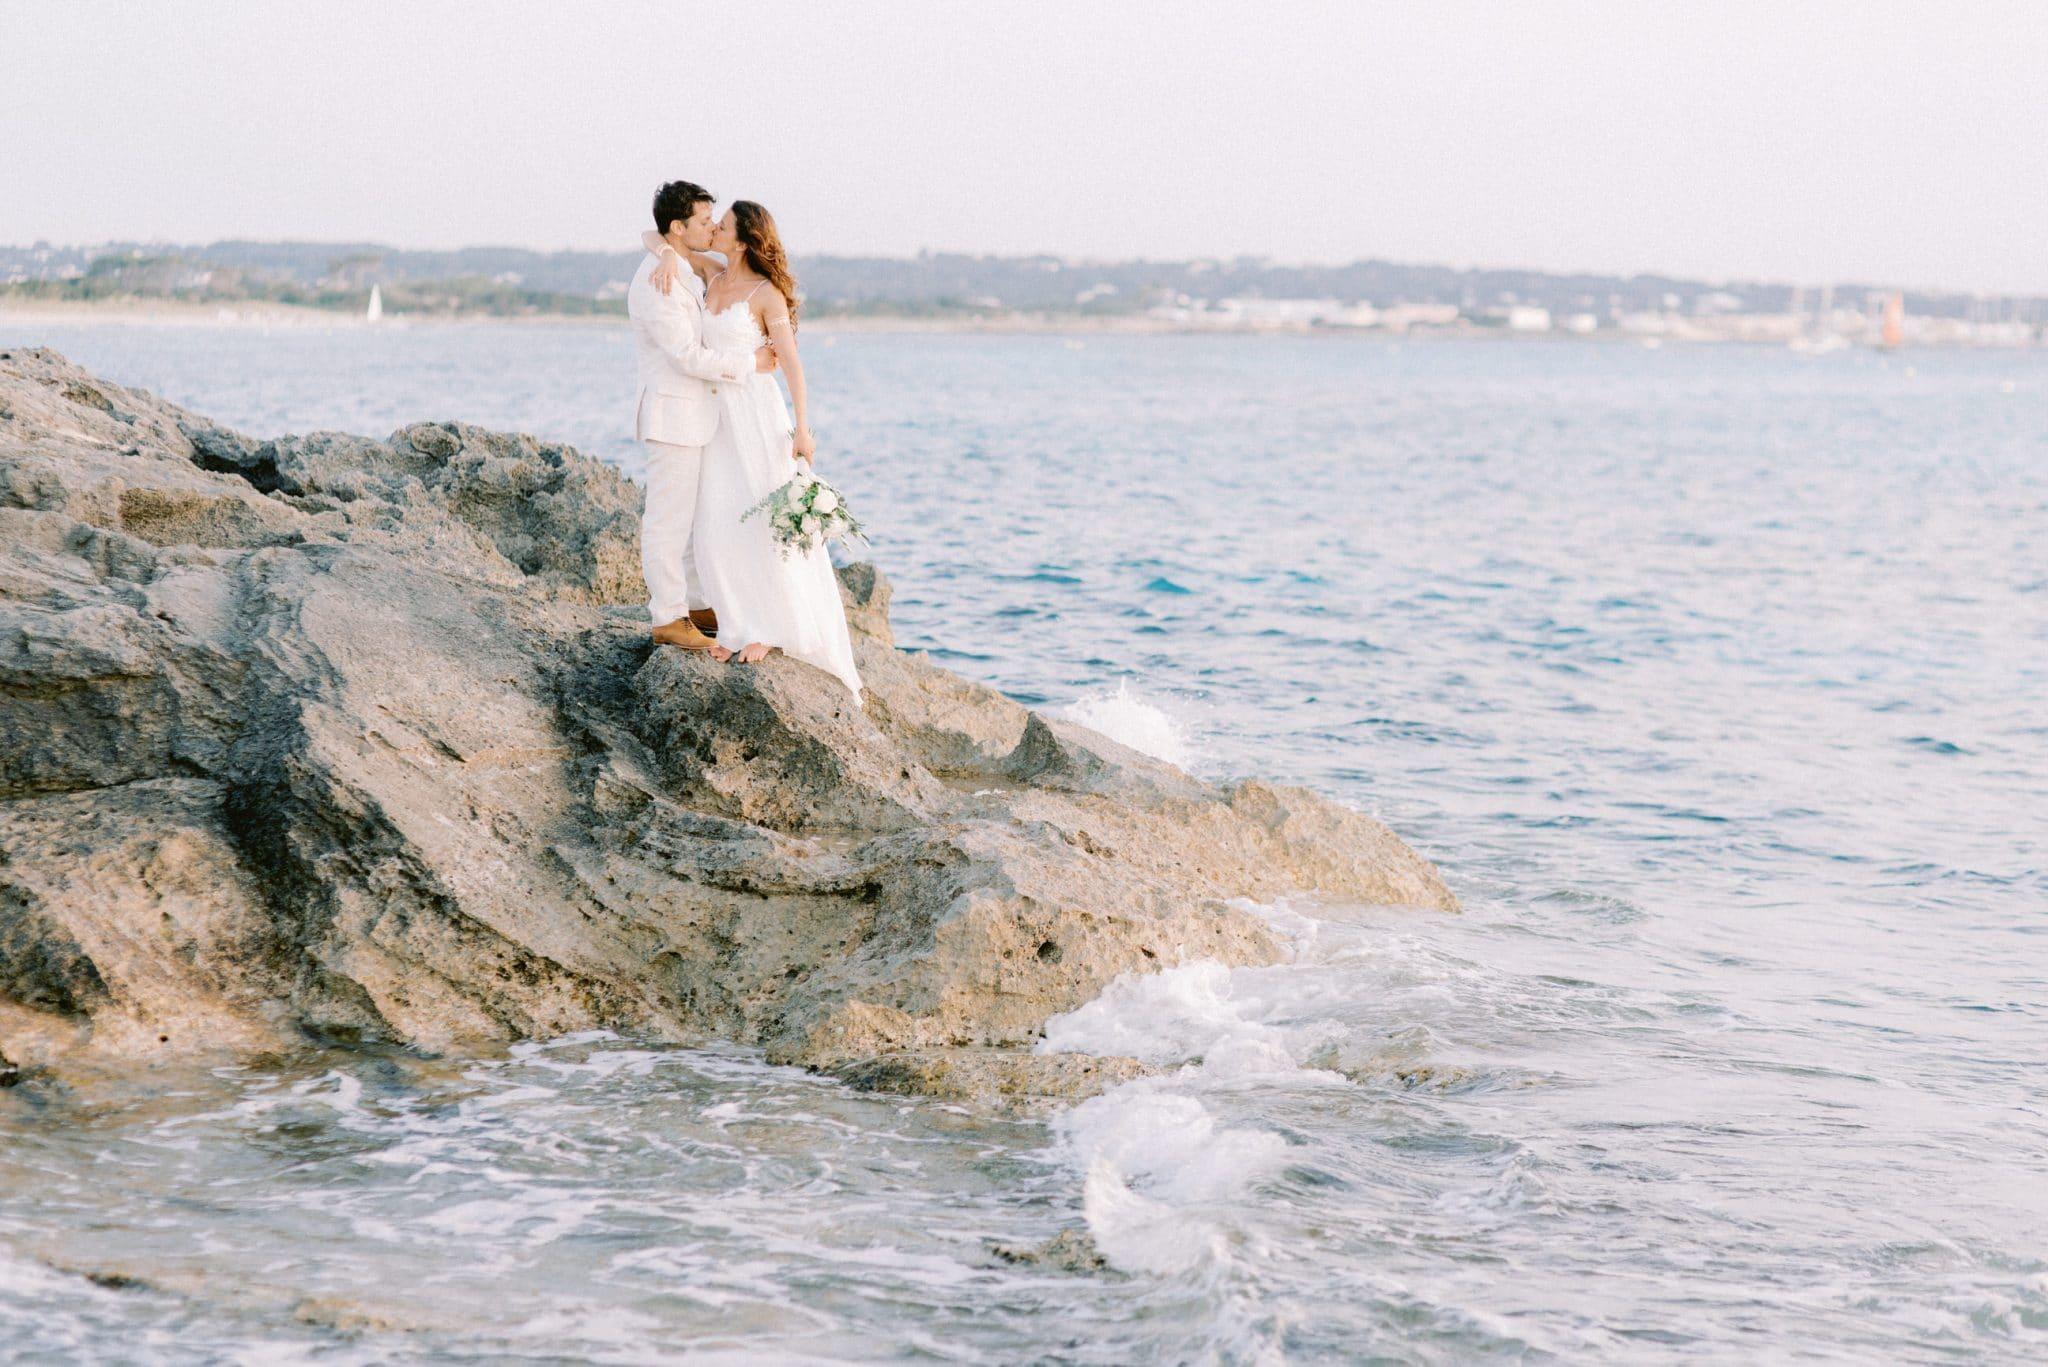 Wedding Photographer Formentera - Youri Claessens Photography